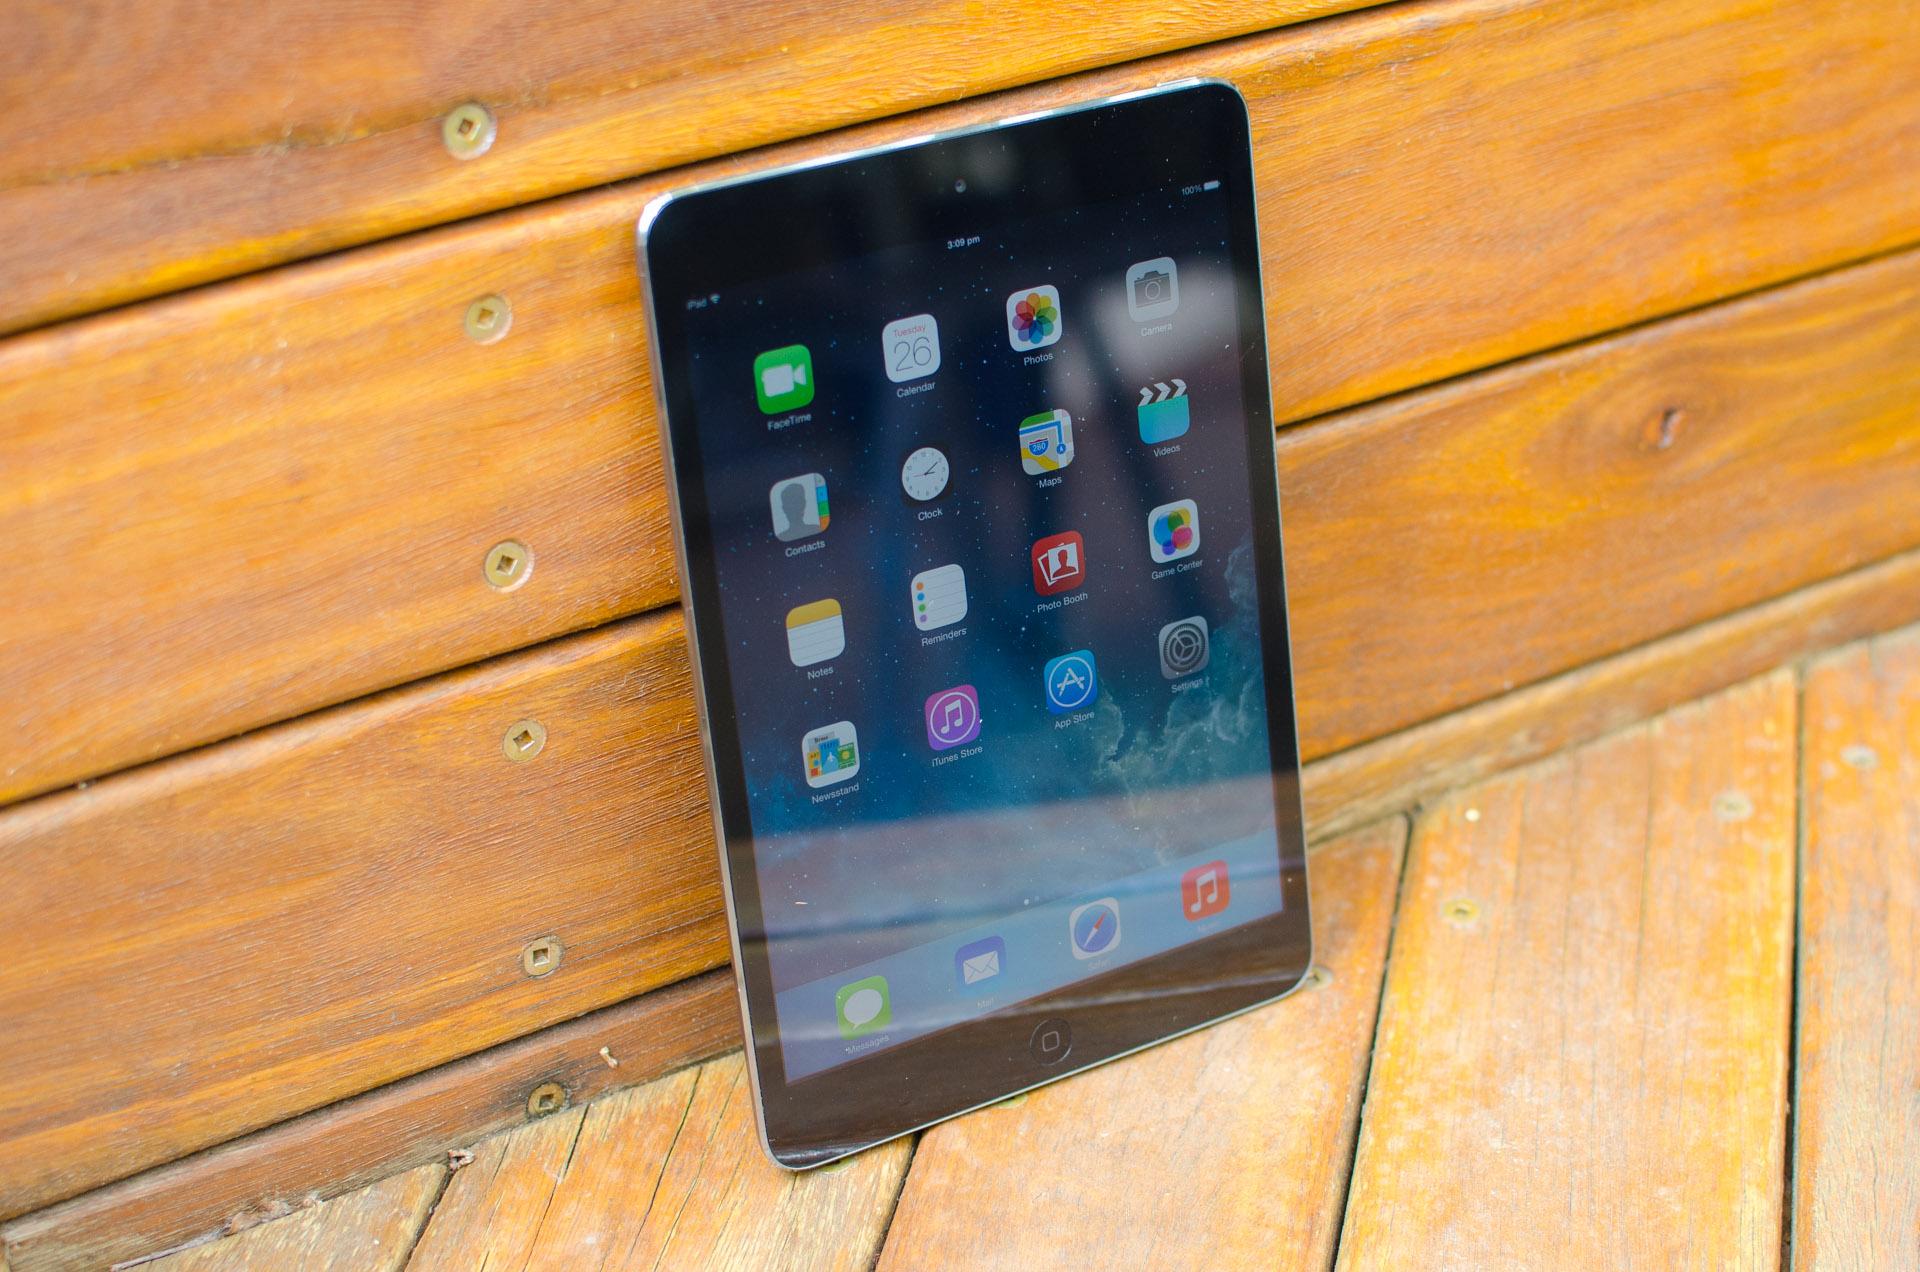 Apple iPad mini 2 Review Photo Gallery - TechSpot